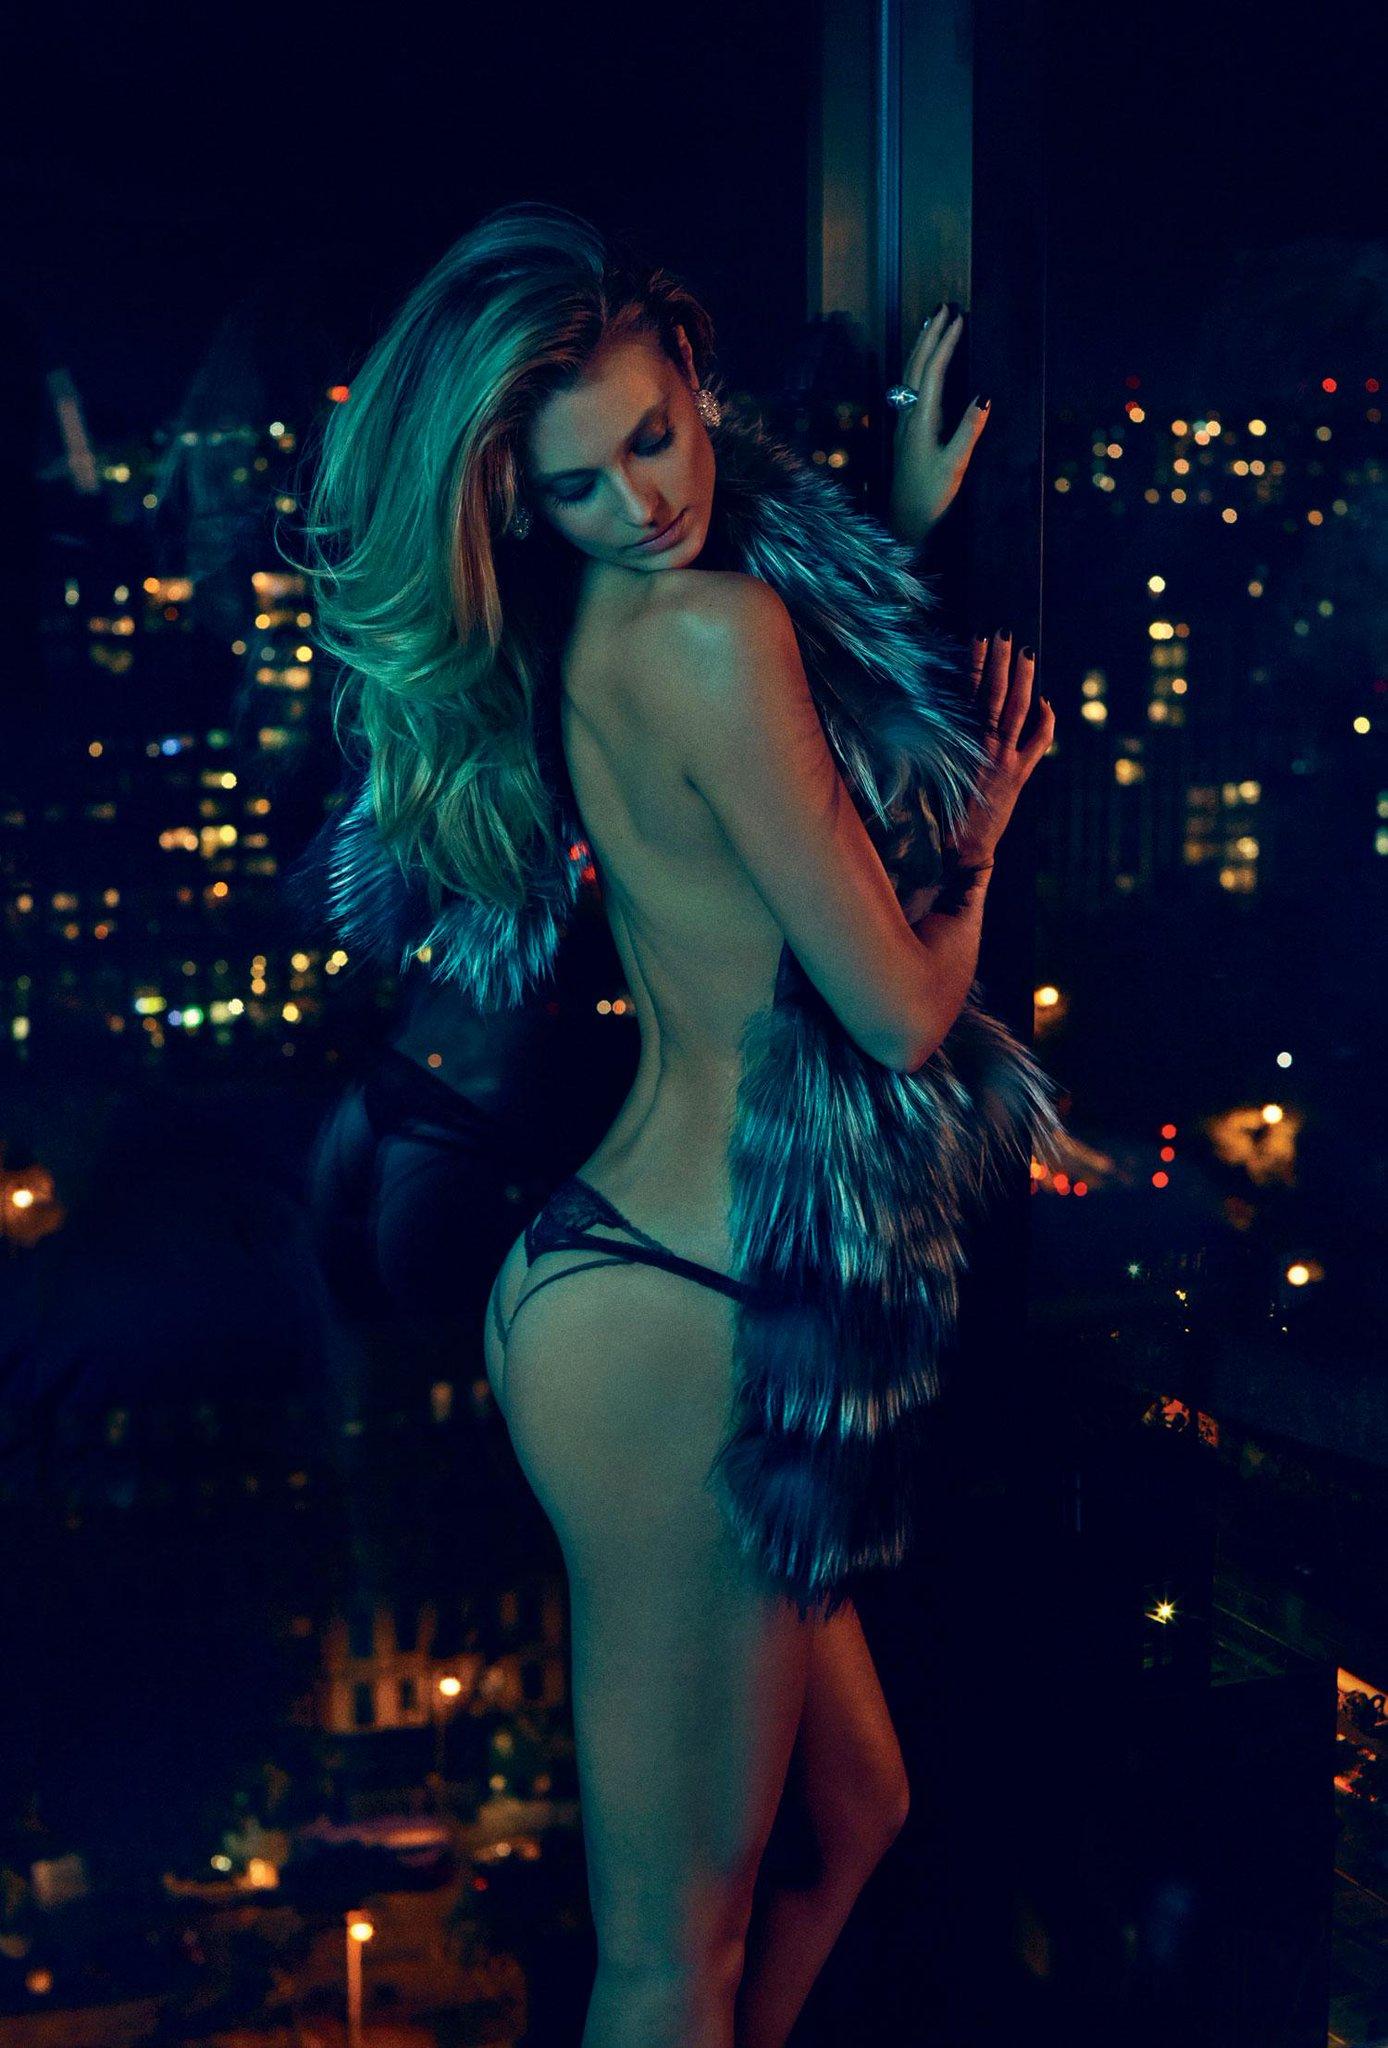 RT @VadimLoparev: My favorite model gorgeous  @katelynnebock  #beautifulwomen Stretching on @MaximMag http://t.co/Cewr2Mii2l #KateBock http…